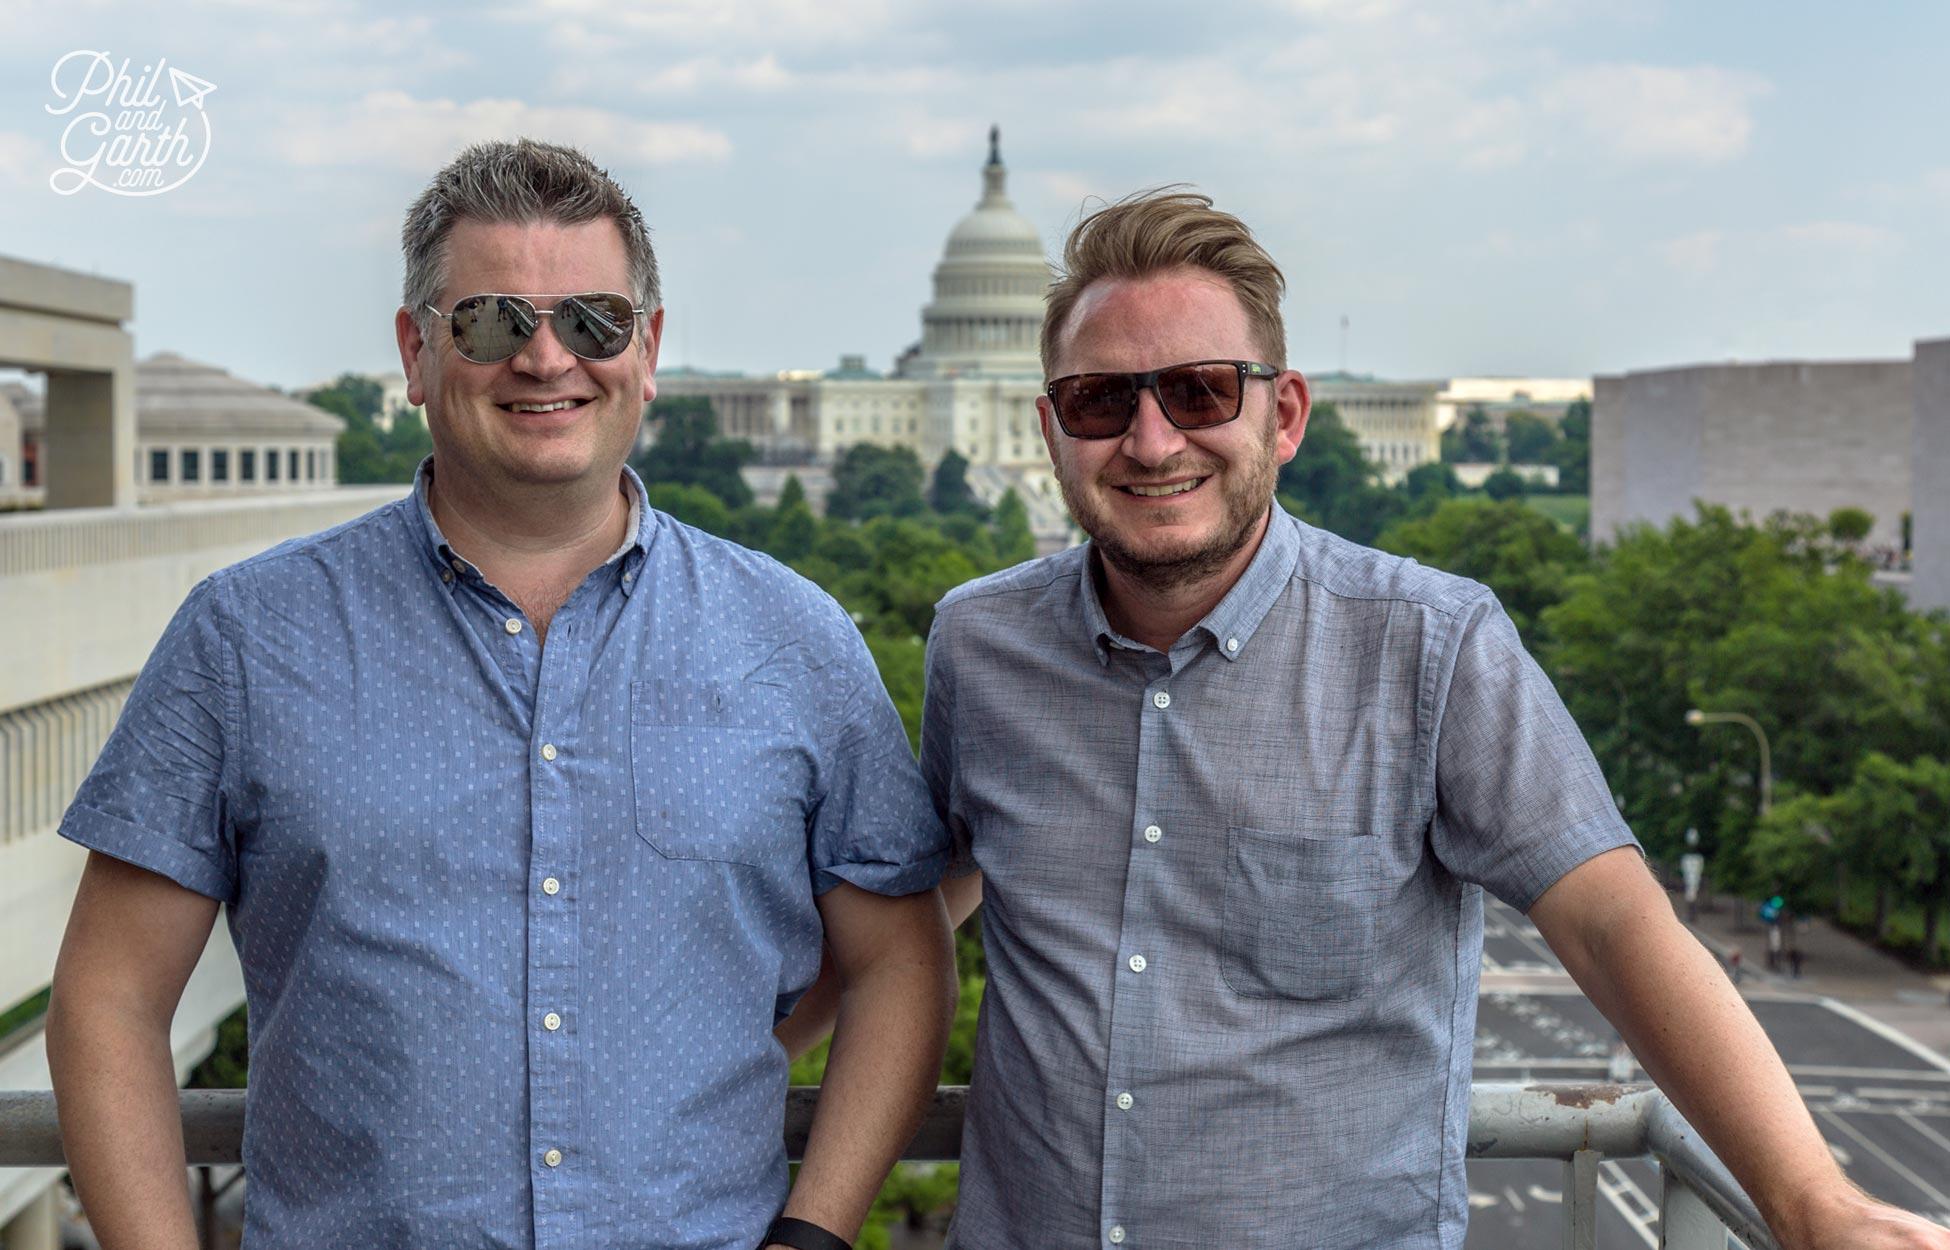 Phil and Garth's Top 5 Washington DC Tips